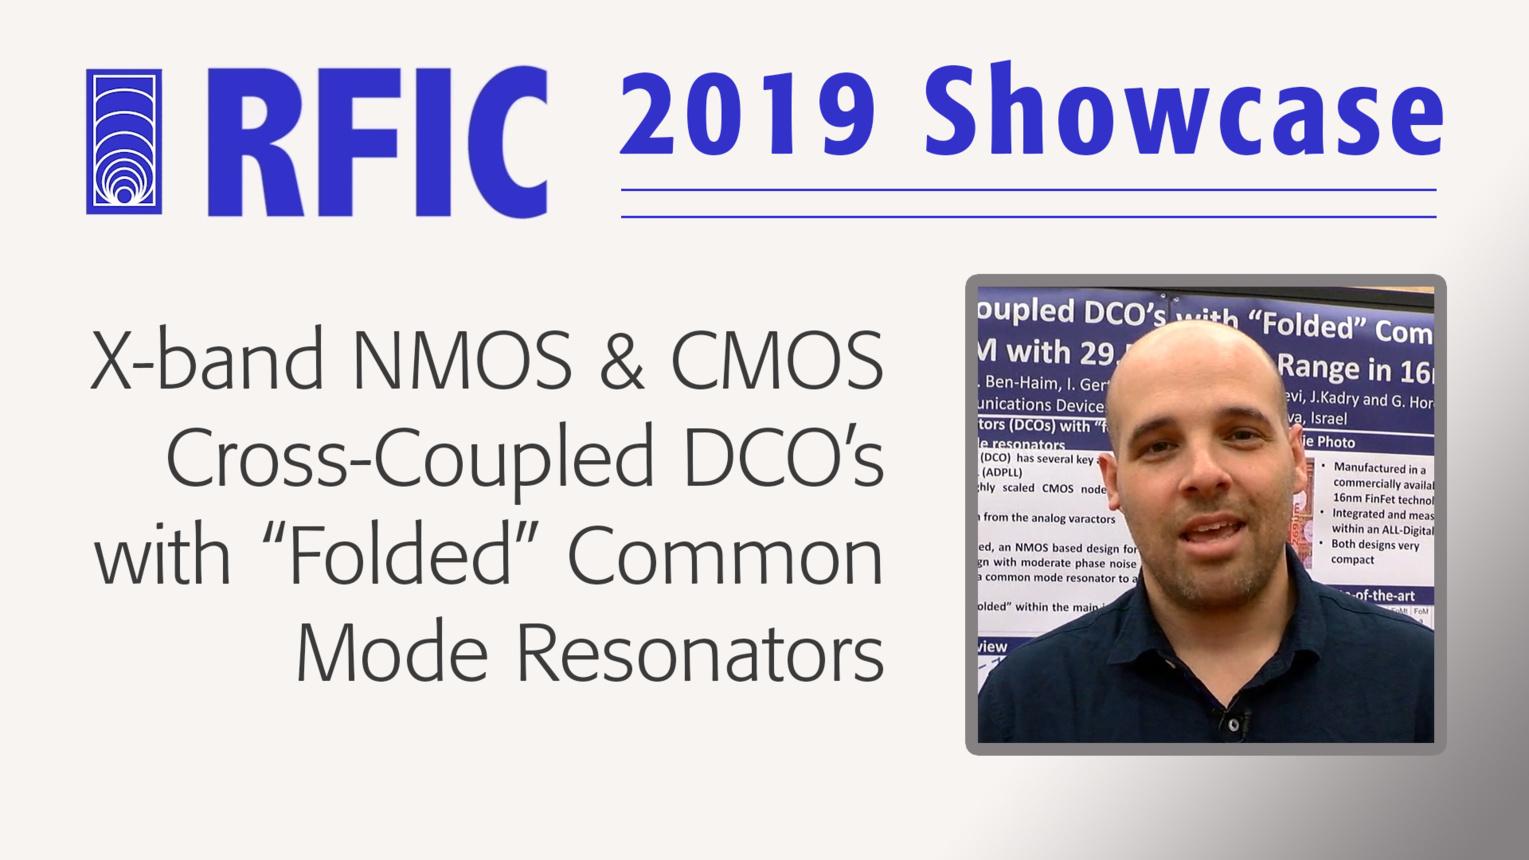 "X-band NMOS & CMOS Cross-Coupled DCO's with ""Folded"" Common Mode Resonators - Run Levinger - RFIC 2019 Showcase"